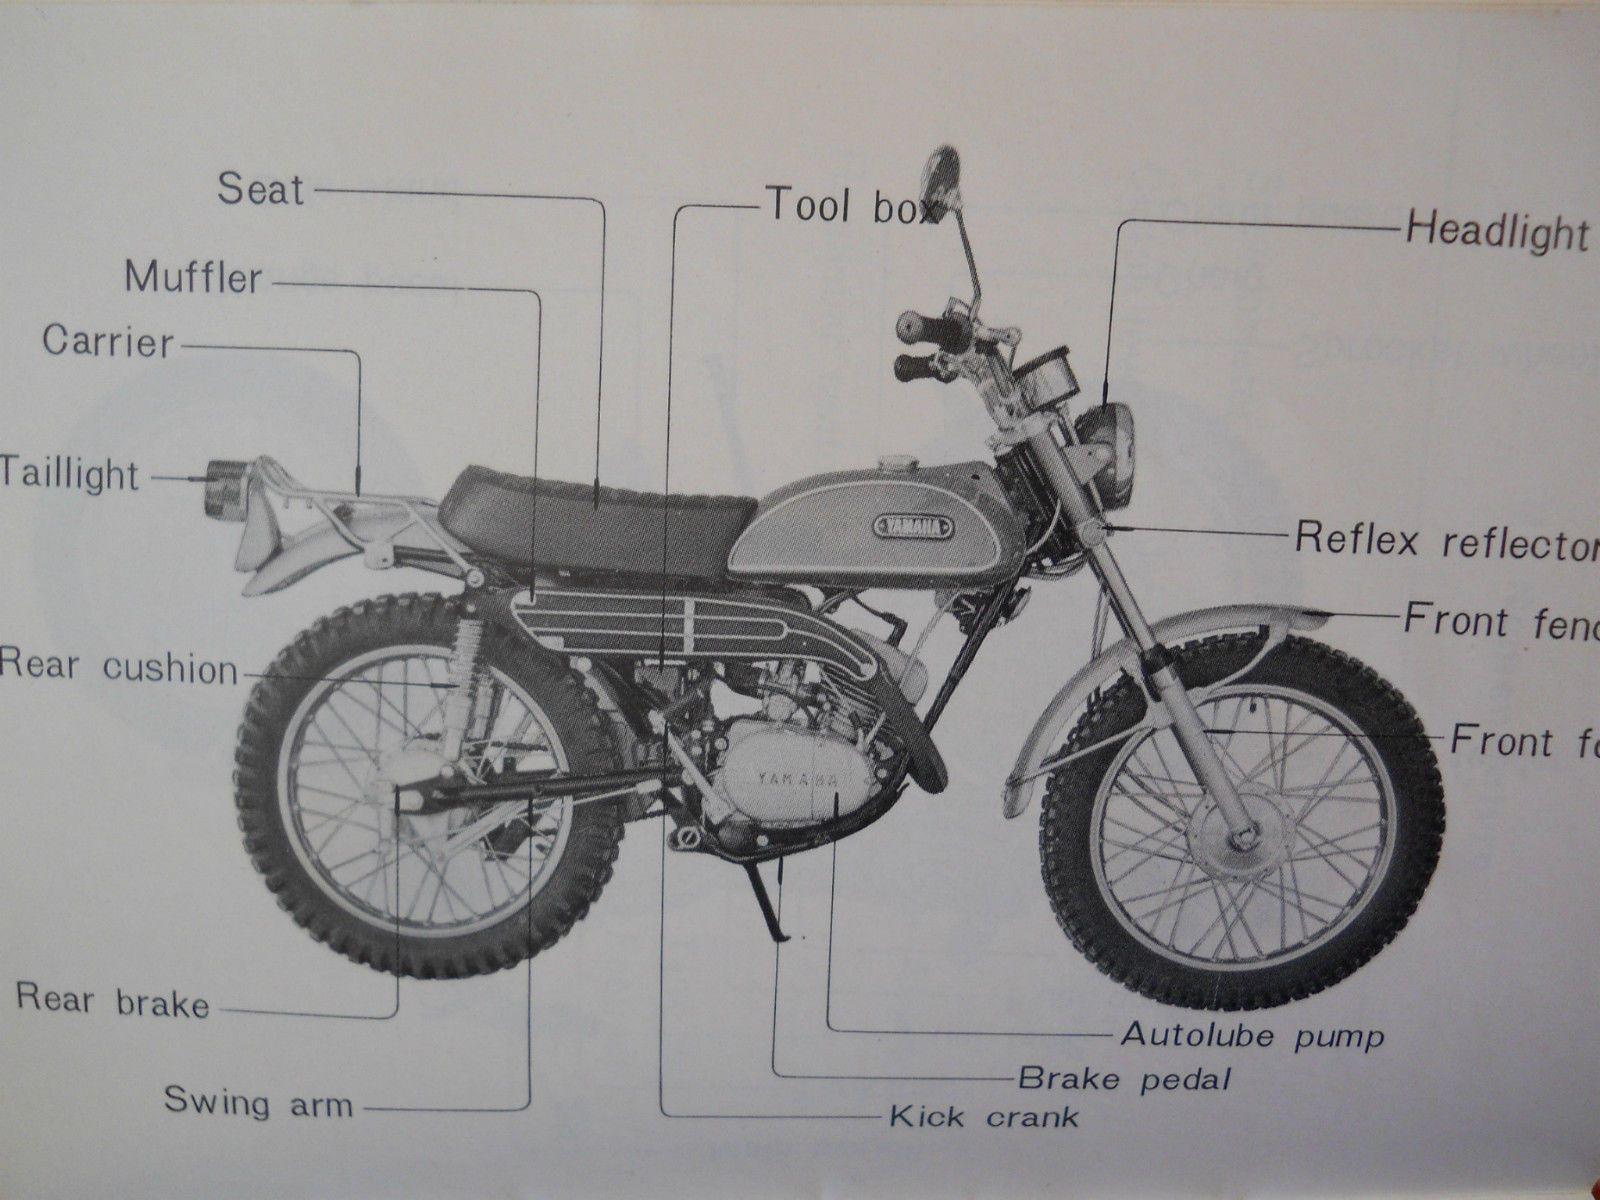 original yamaha 1969 ct1 175 vintage enduro owners manual handbook rh pinterest co uk yamaha motorcycle owners manuals free yamaha motorcycle owners manuals free